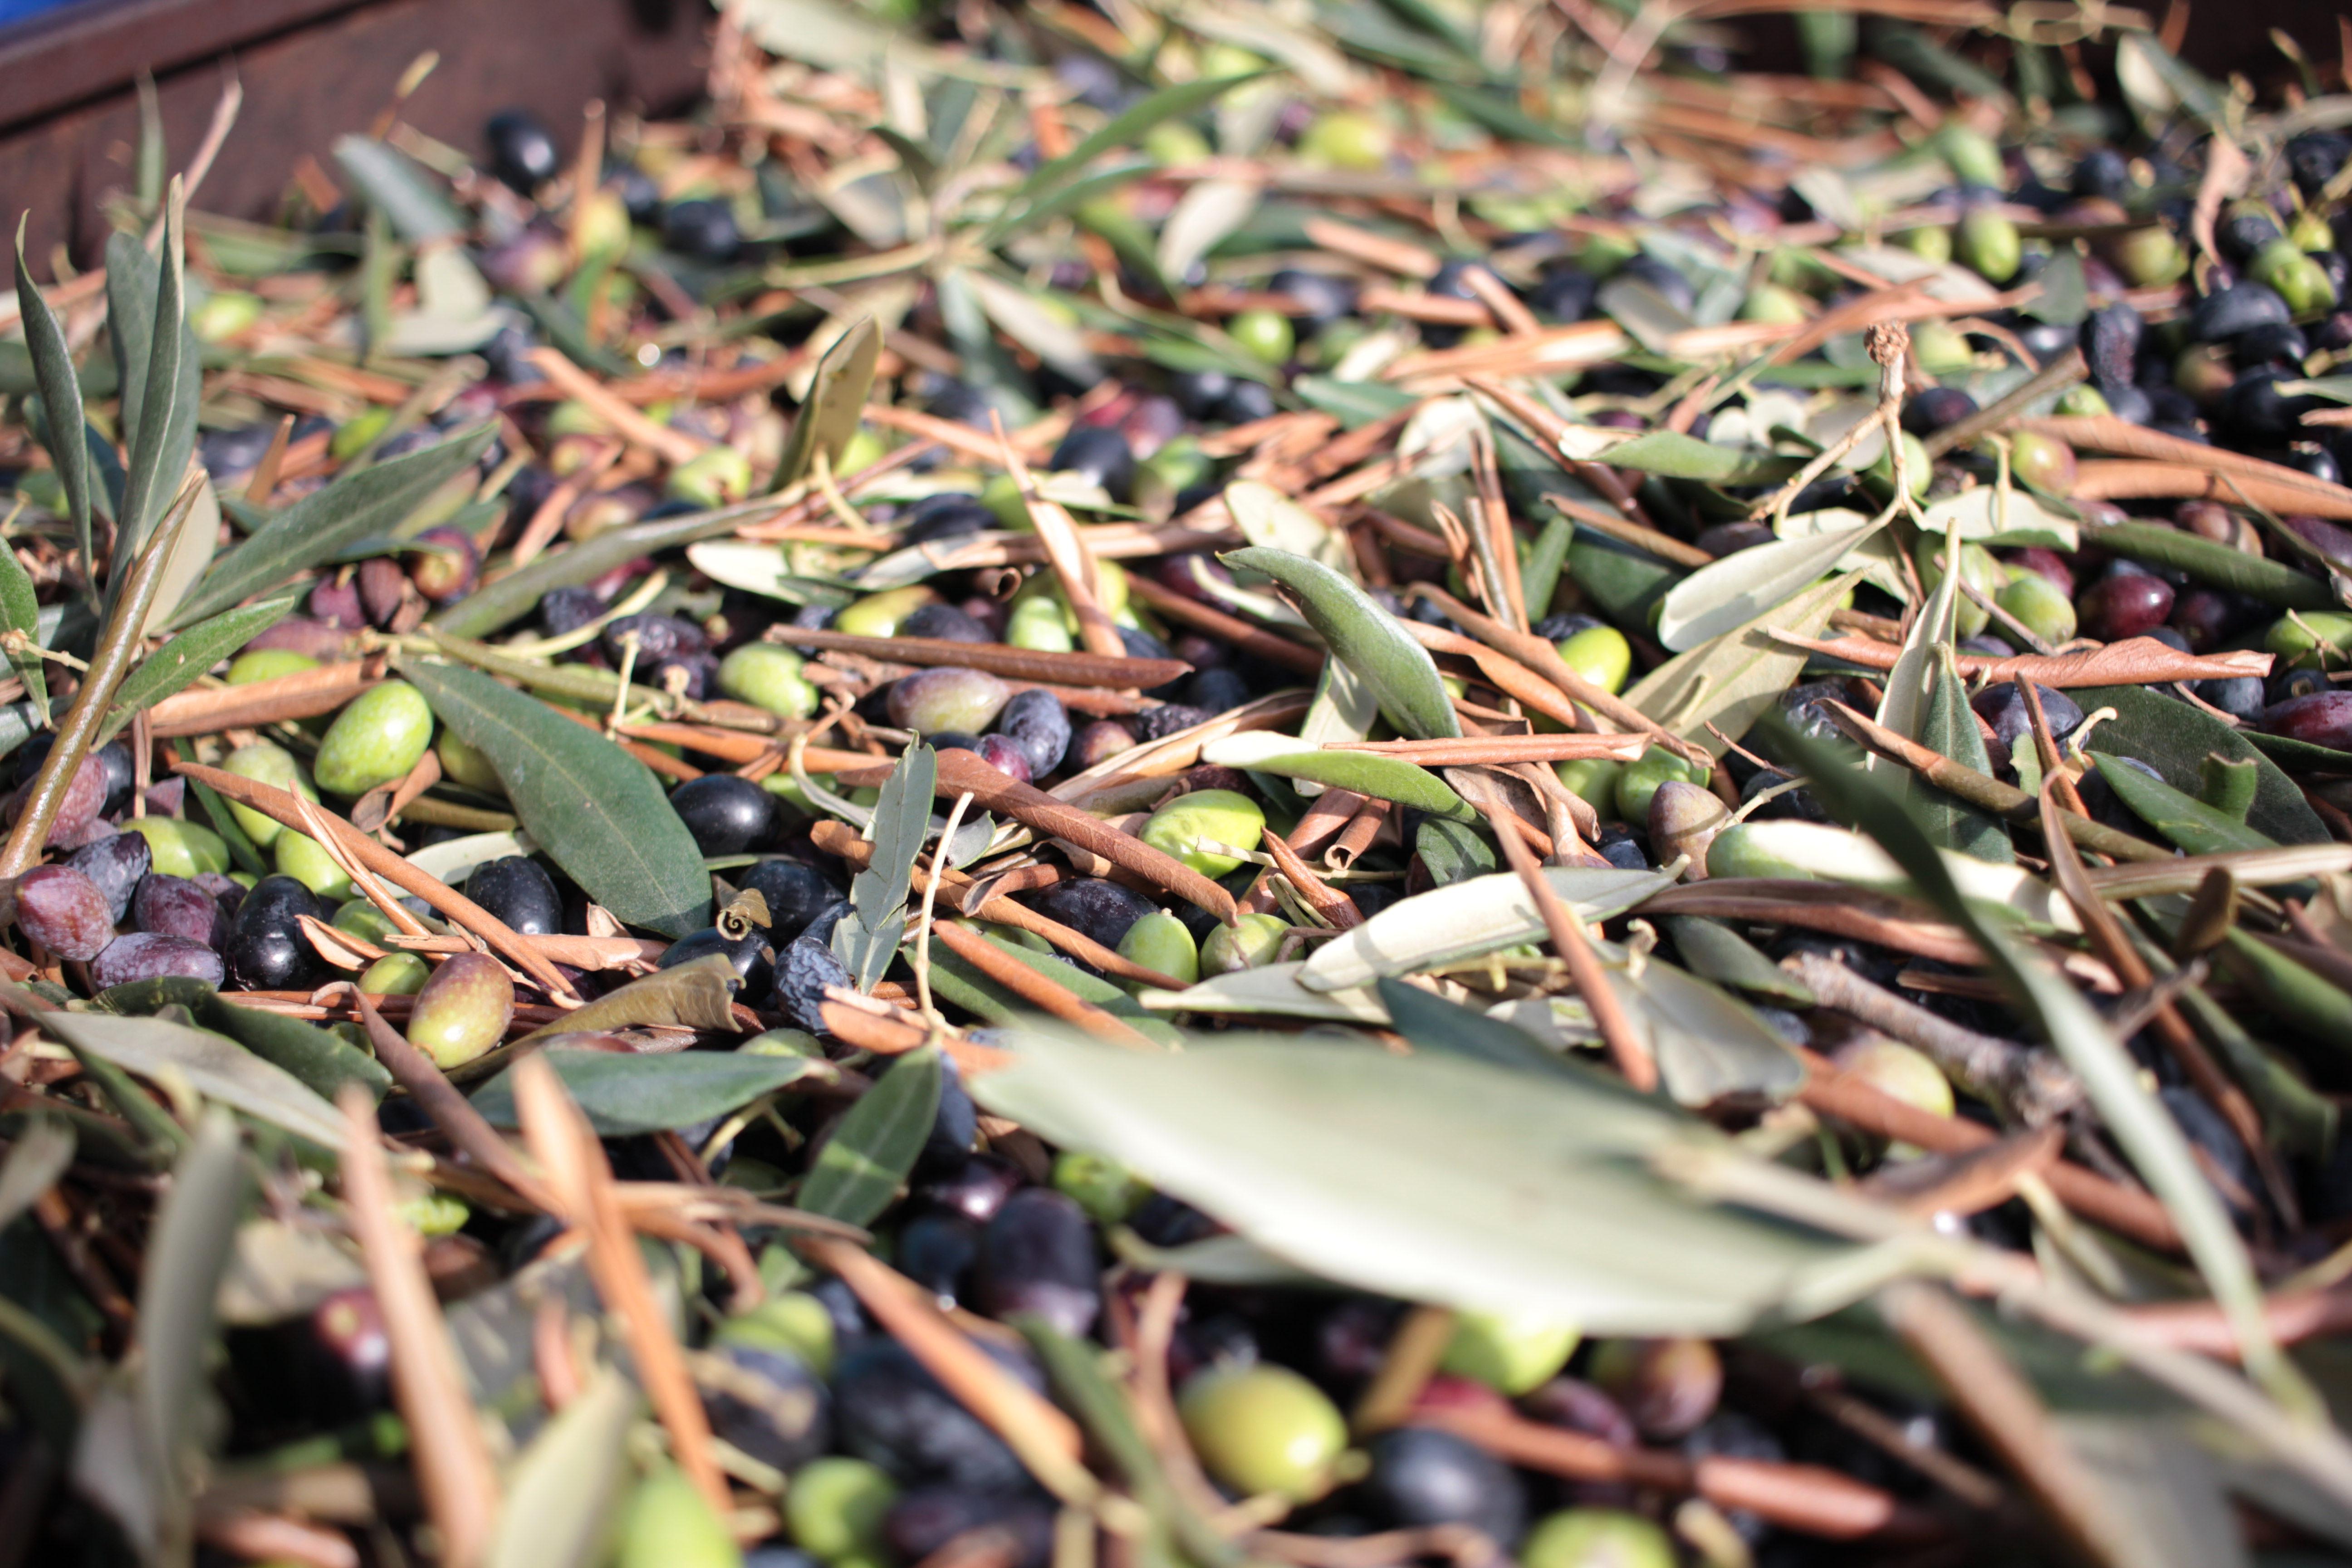 Olio Salve, Olio extravergine di oliva, Salento, Salve, Polesine